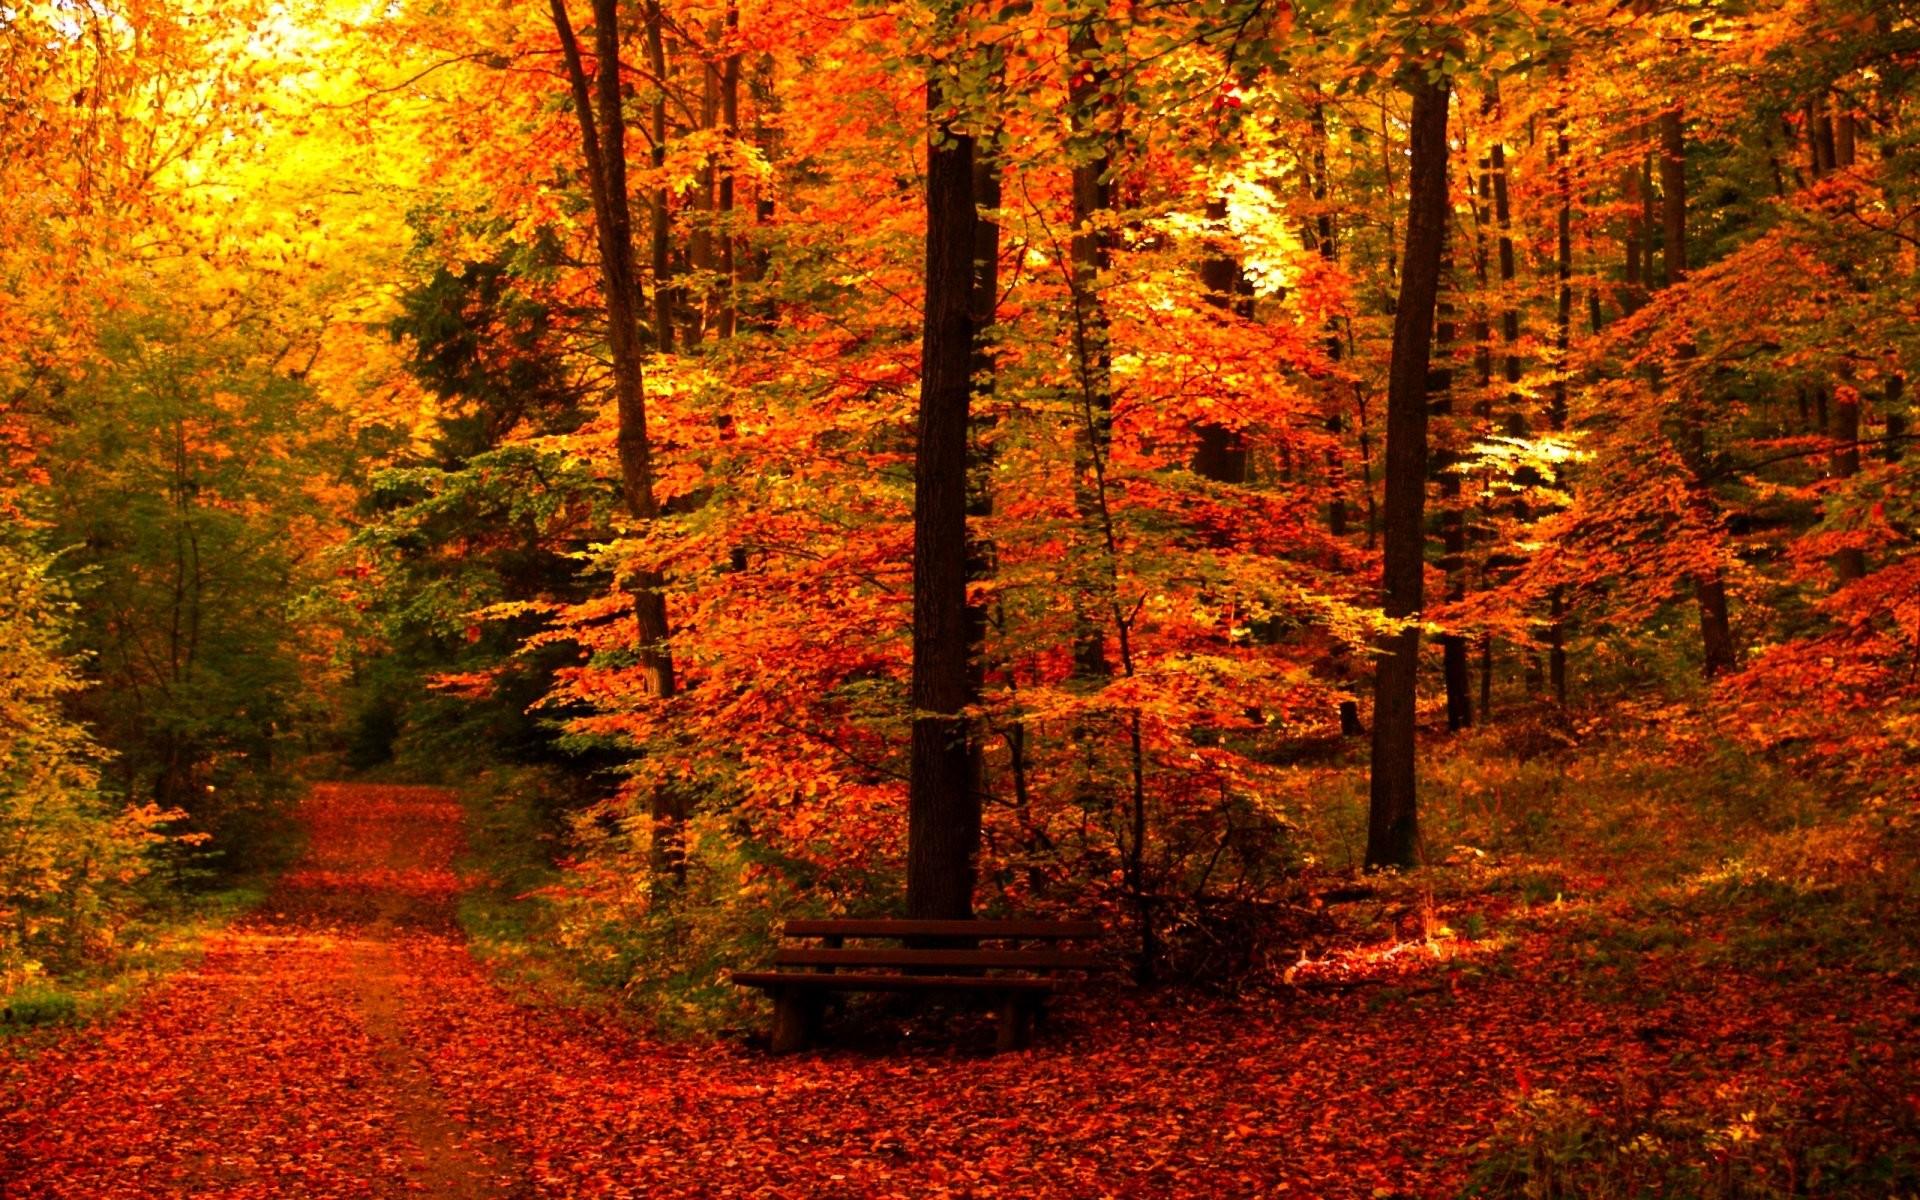 Autumn fall season nature landscape leaf leaves color seasons tree forest  wallpaper     945301   WallpaperUP